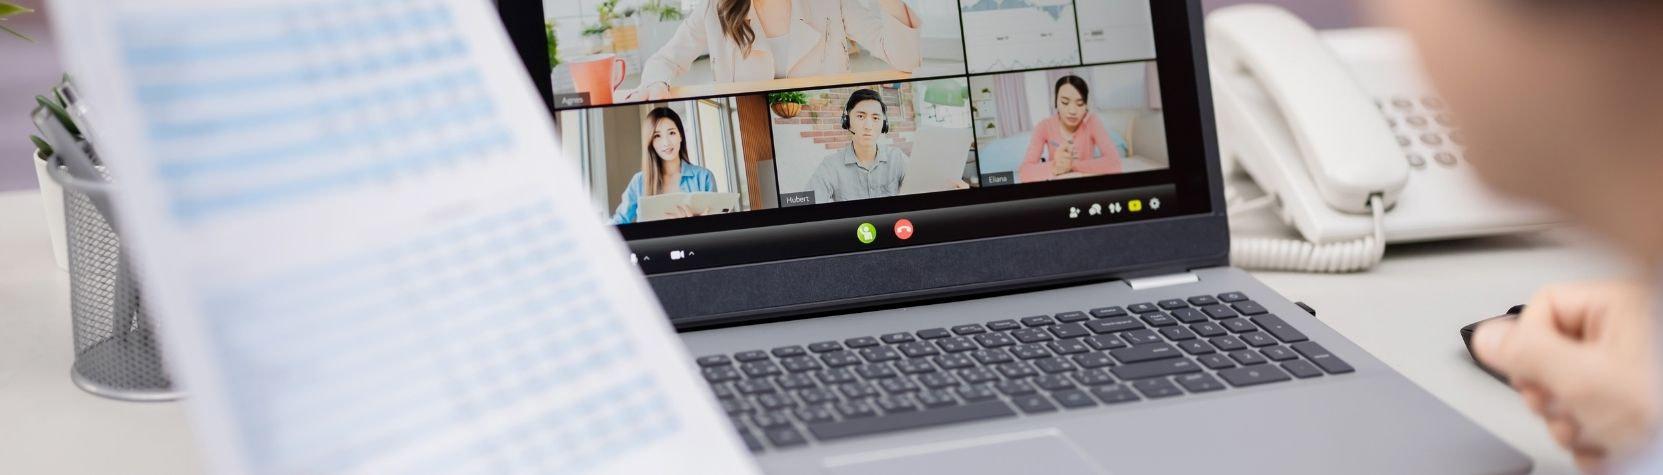 Vds training consultants blog effectief virtuele meetings leiden